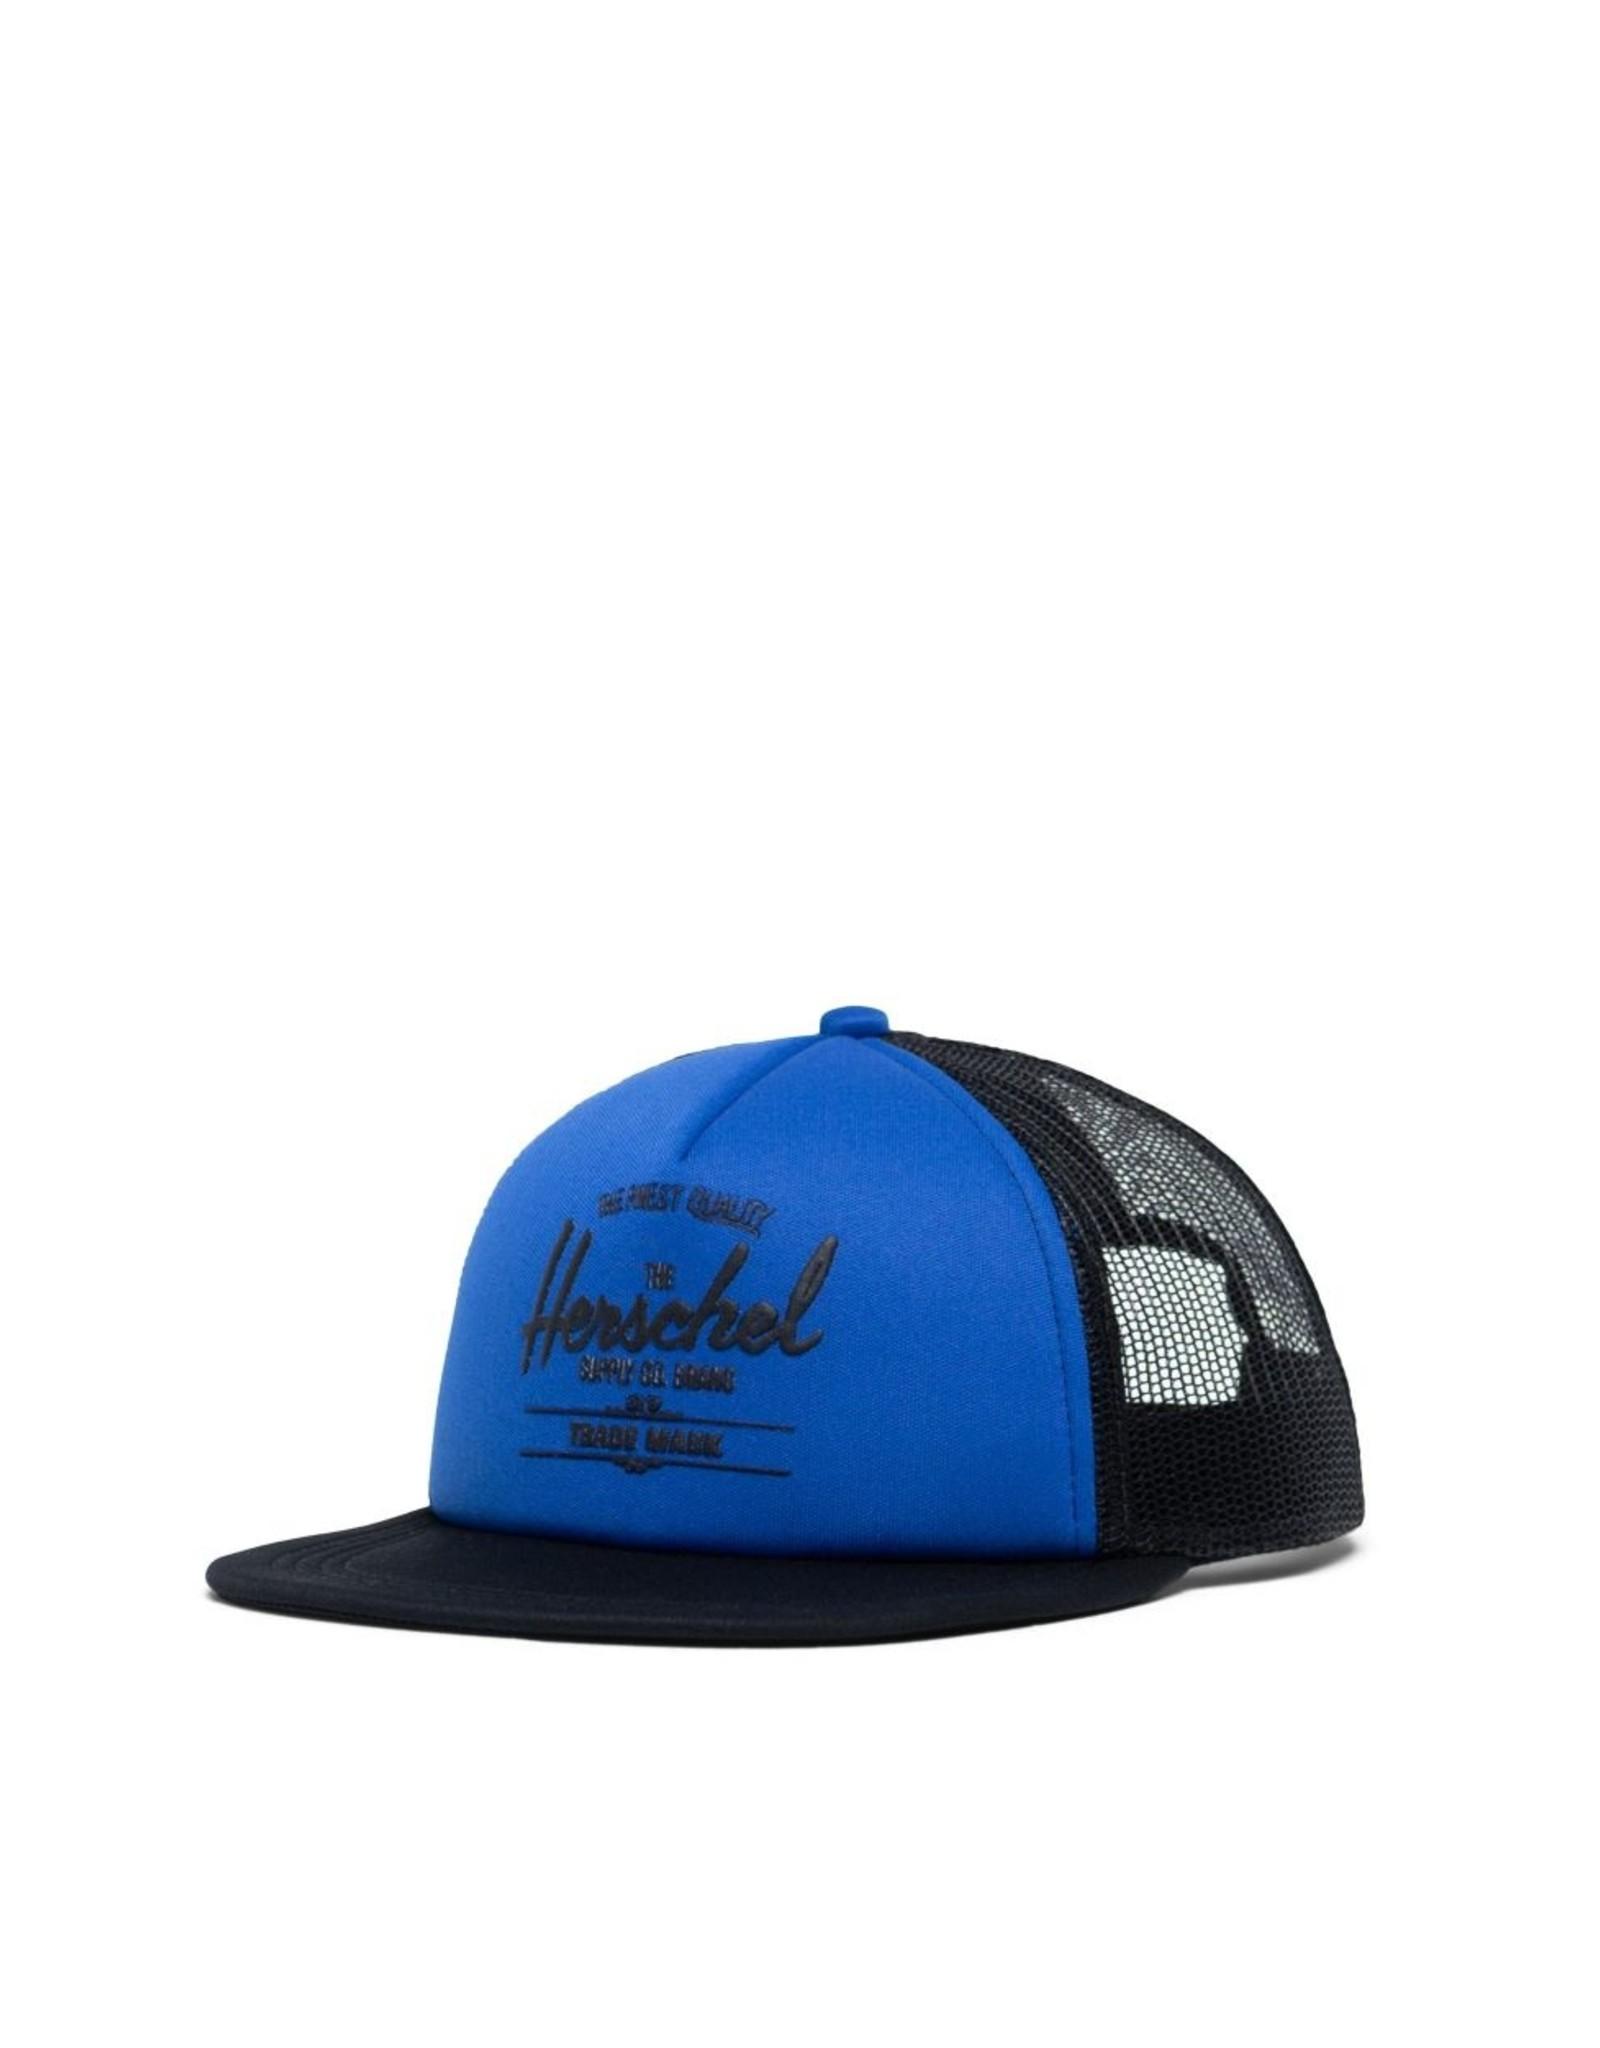 Herschel Supply Co. FA20 Blue Whaler Cap 2-5Y